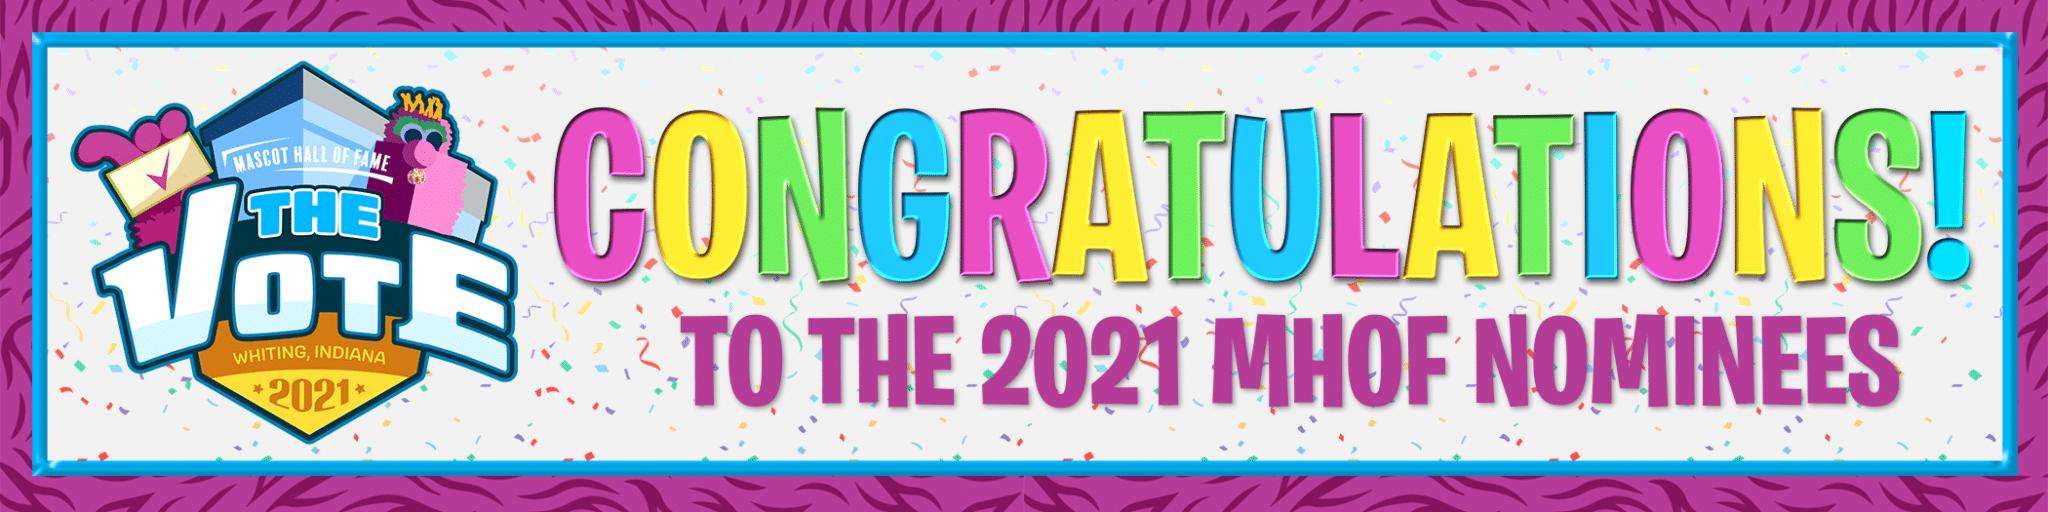 MHOF The Vote Congrats Website Banner